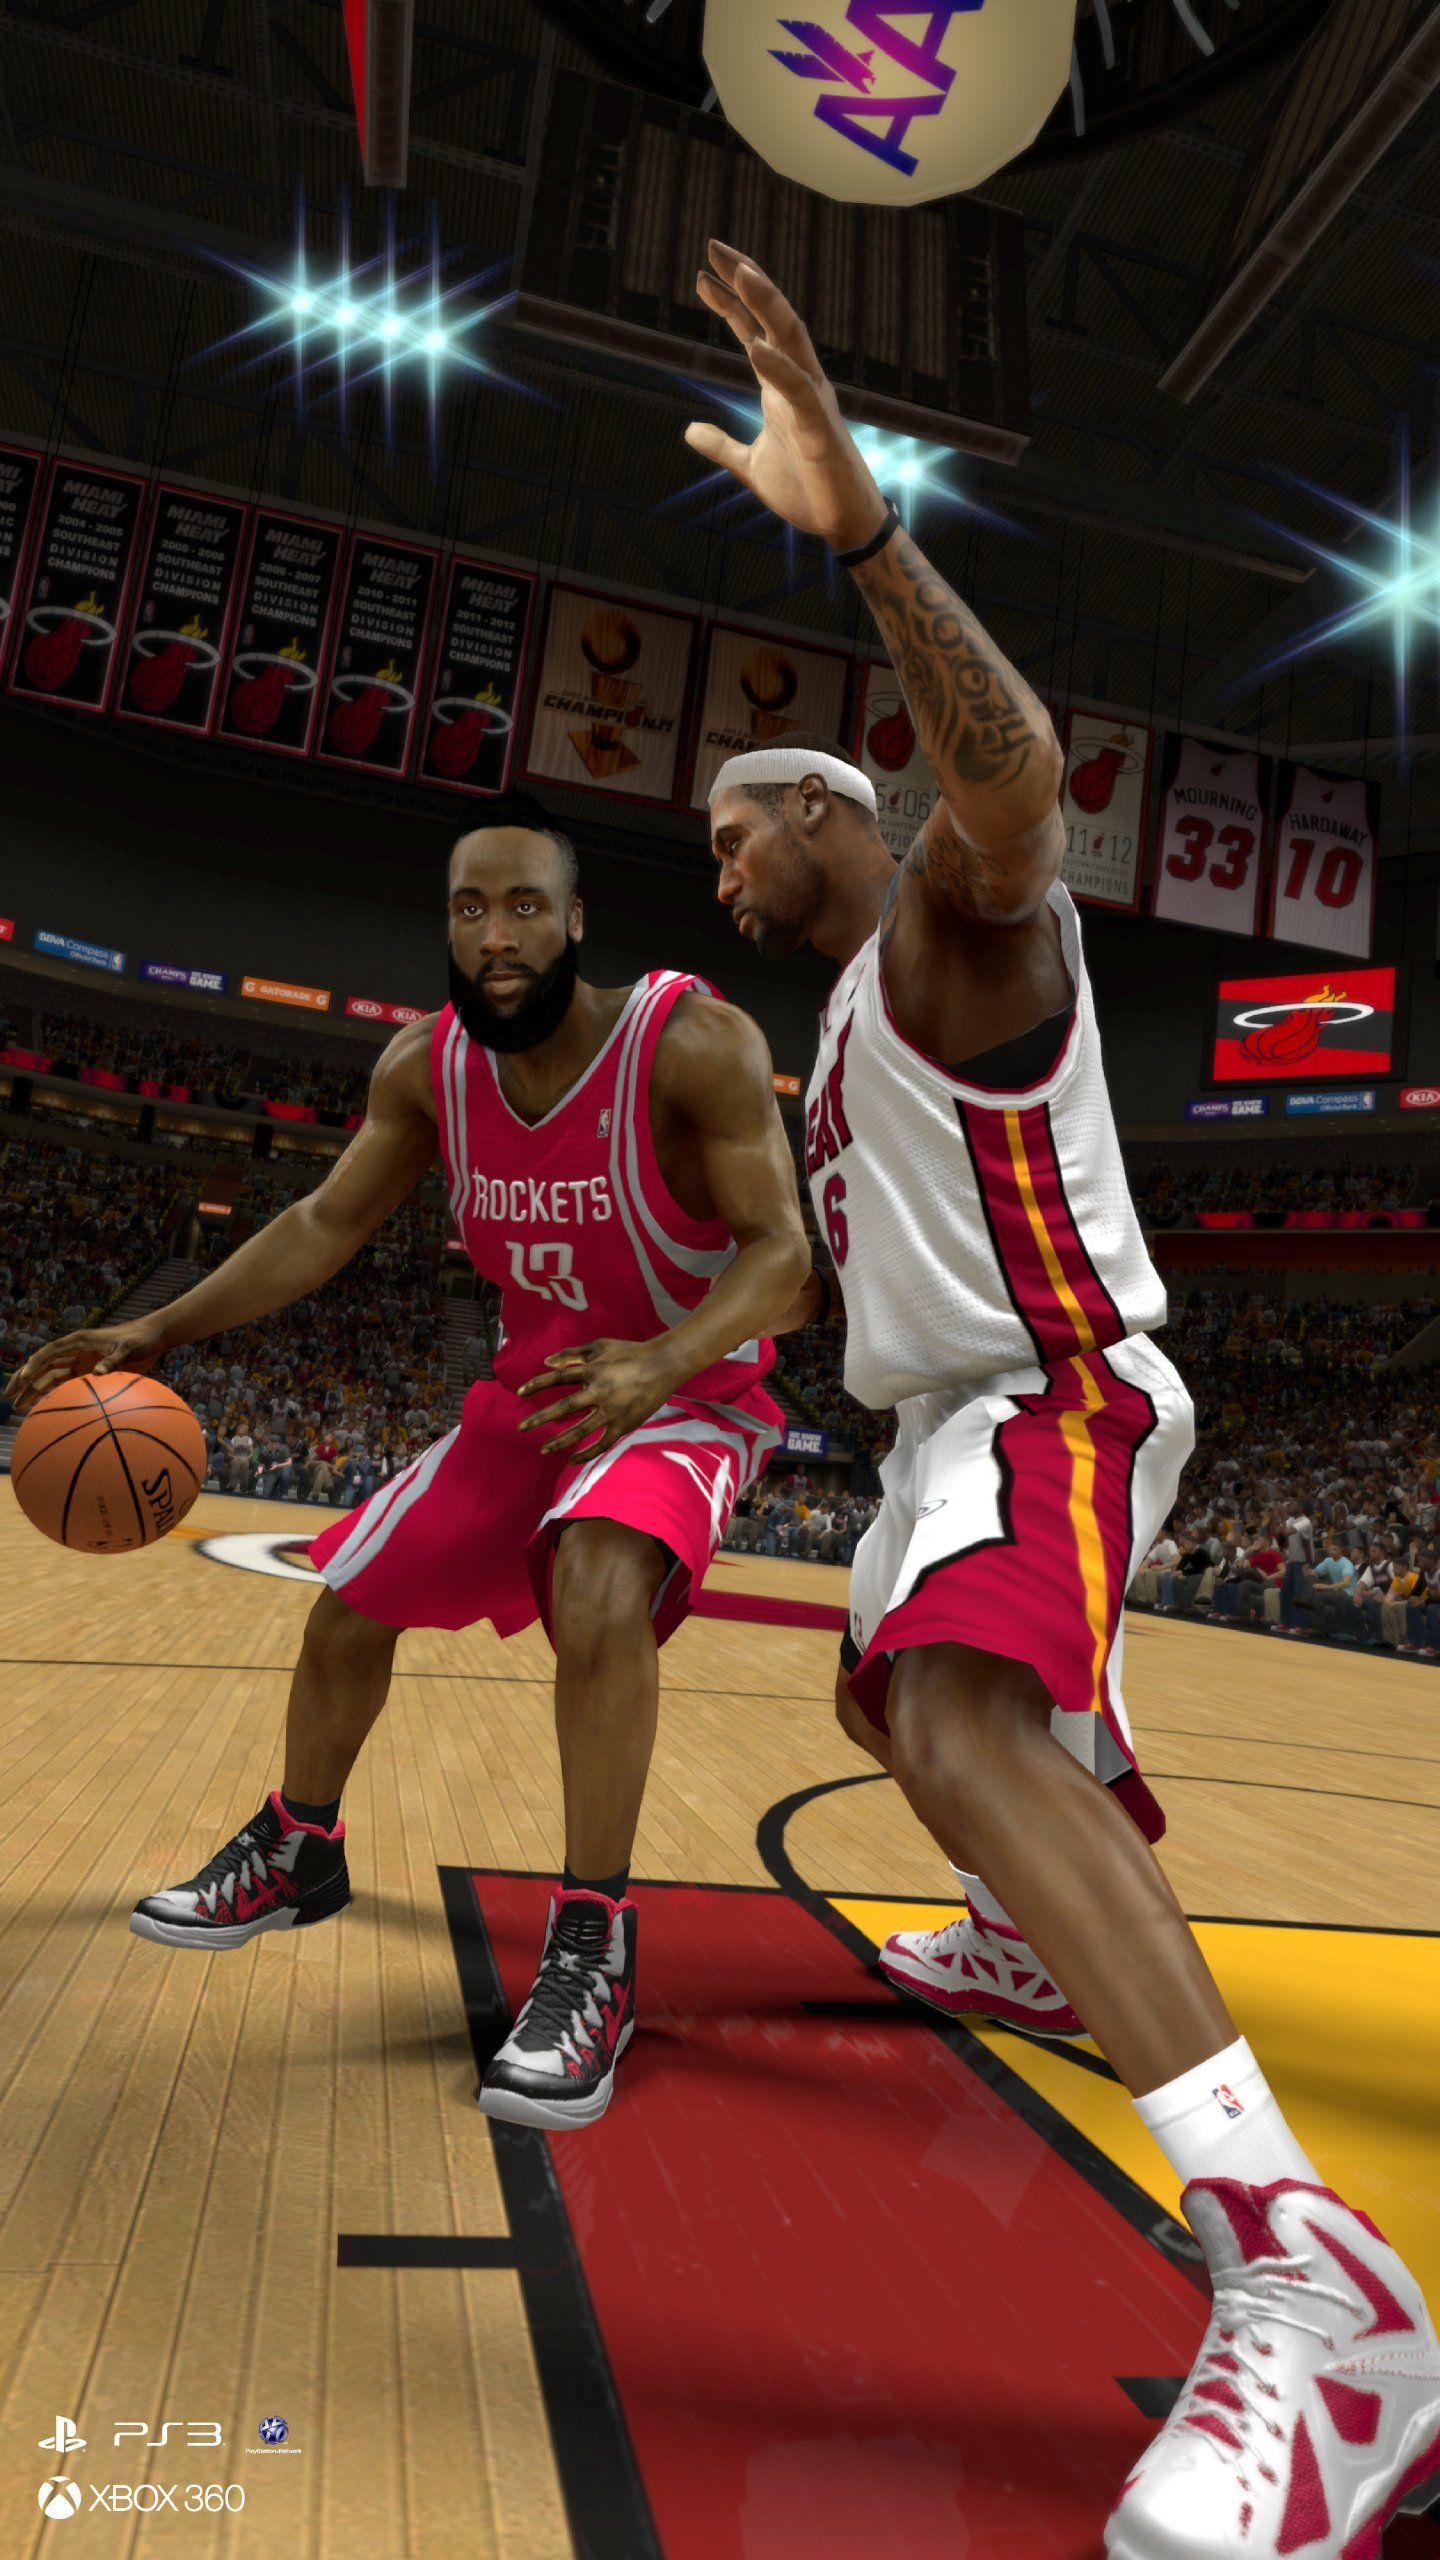 NBA 2K14 Xbox 360 For more information, visit image